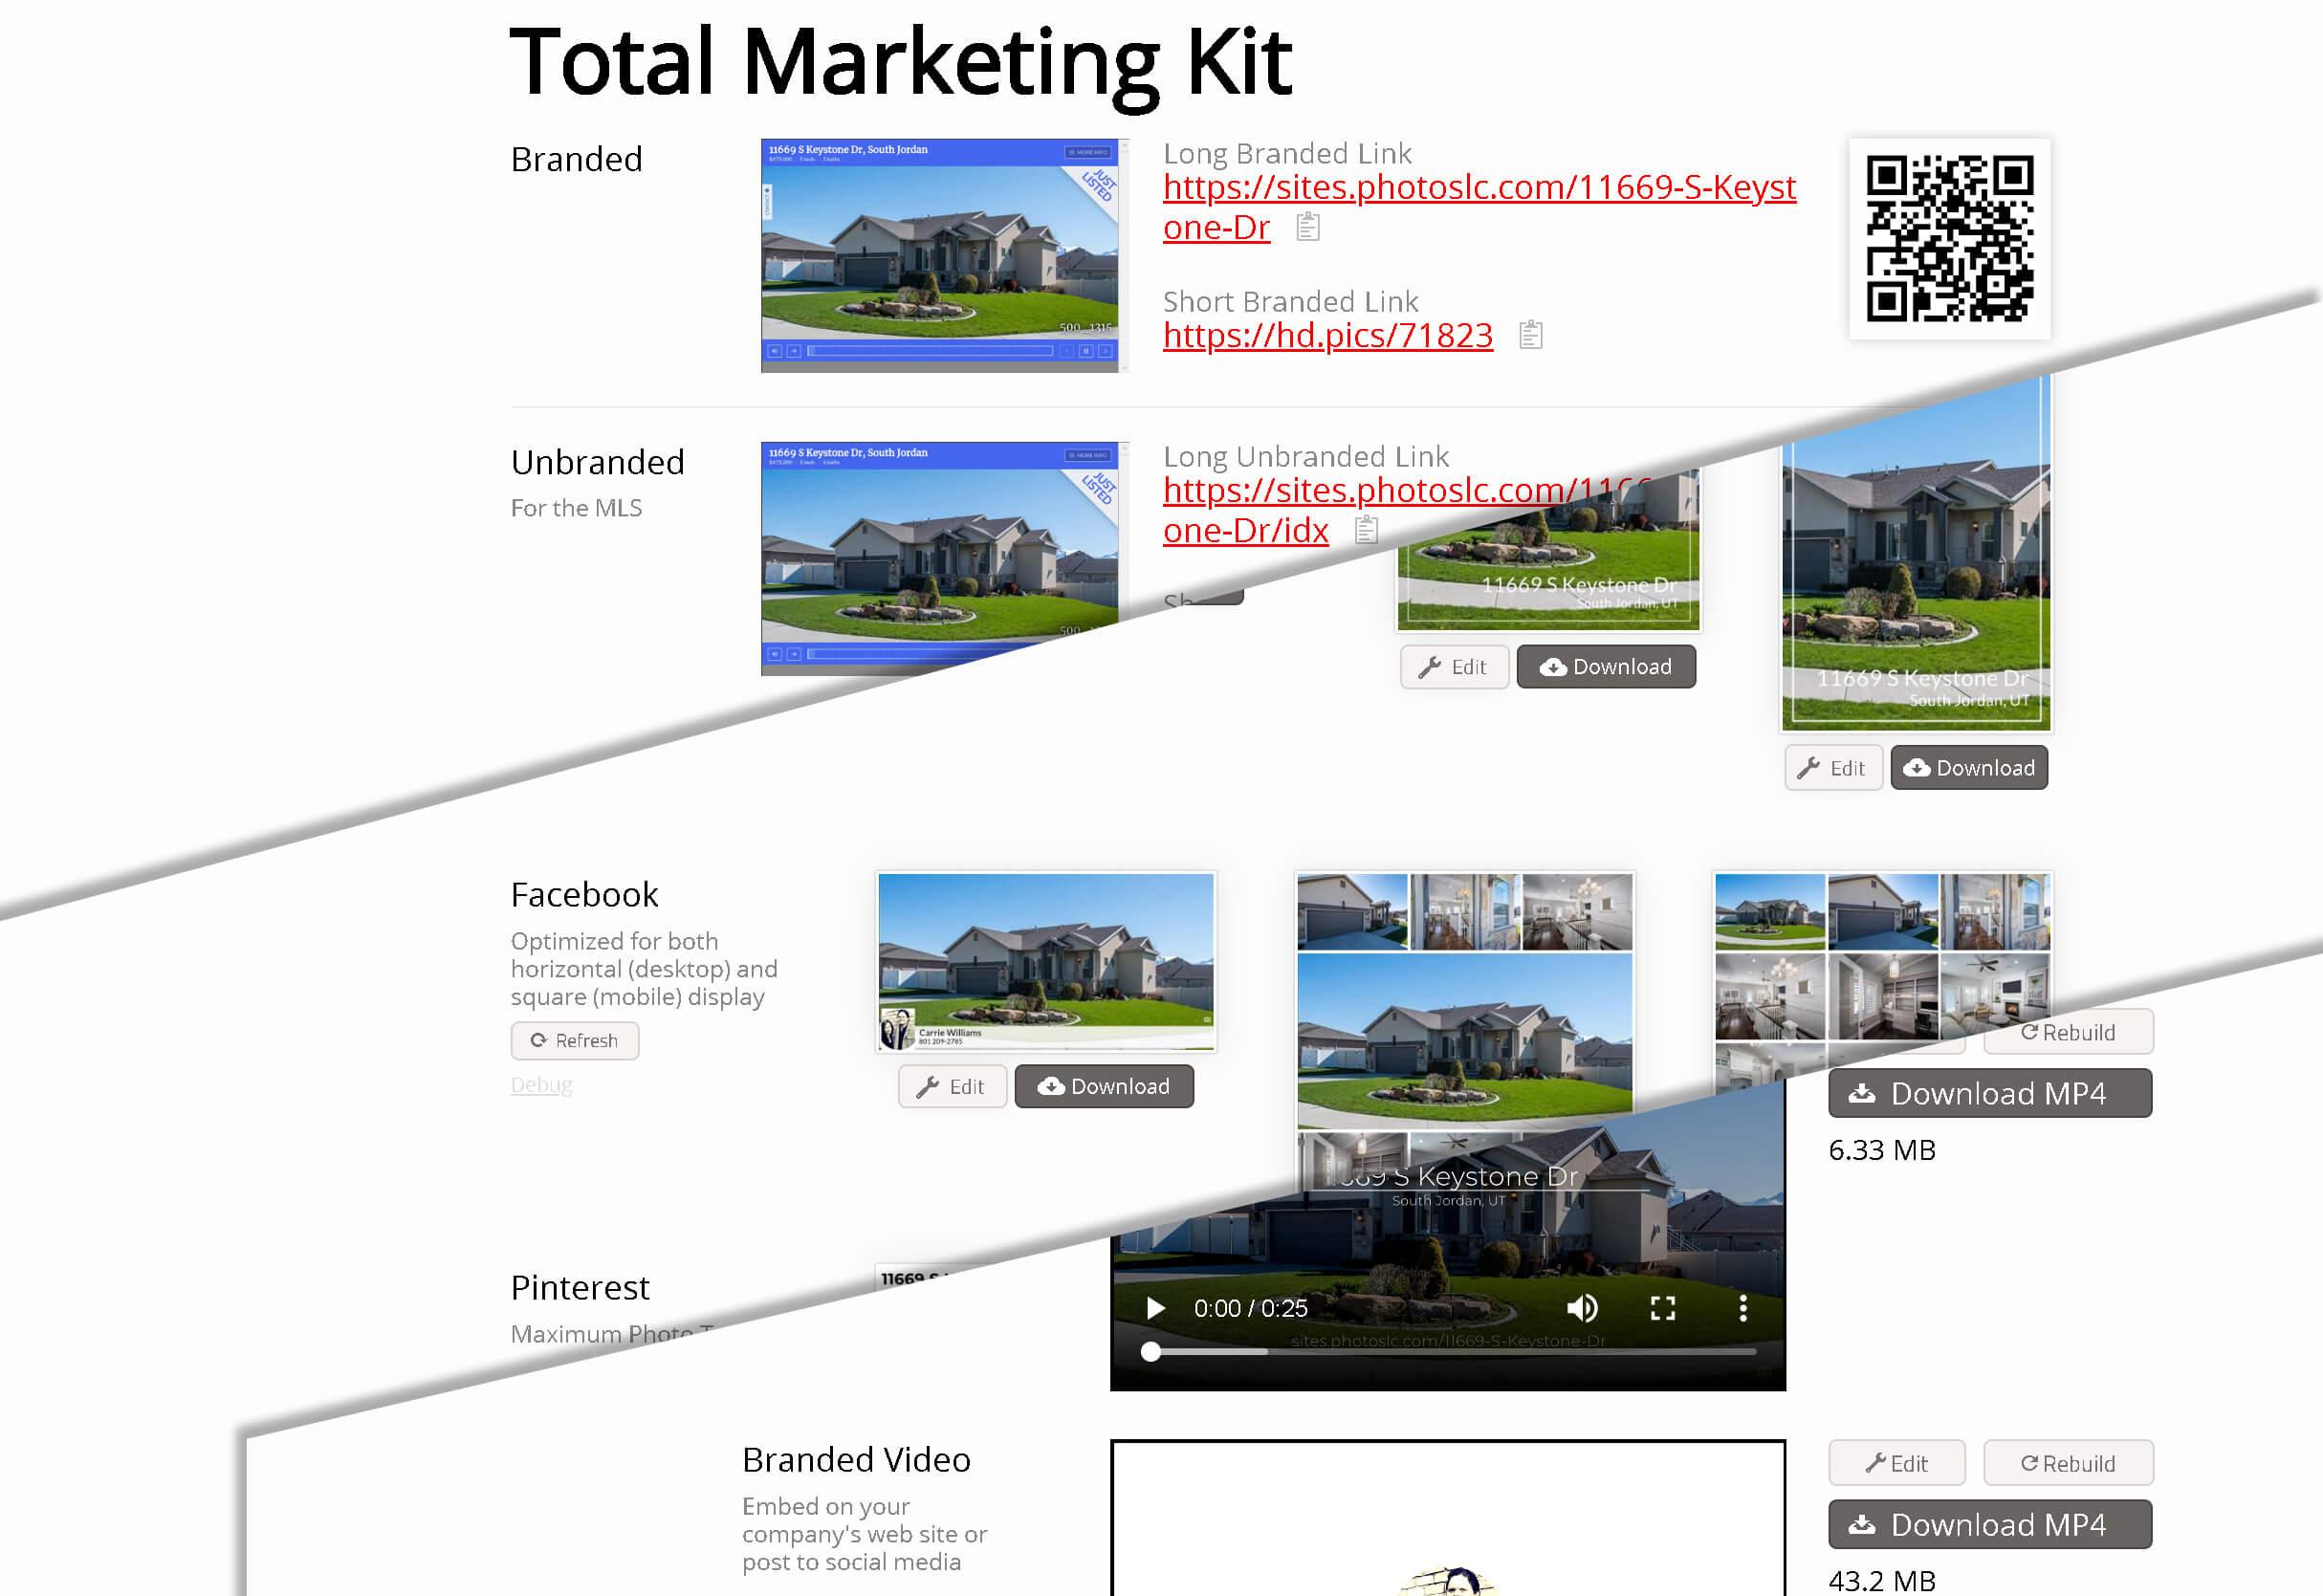 New Social Media and Video Marketing Kit